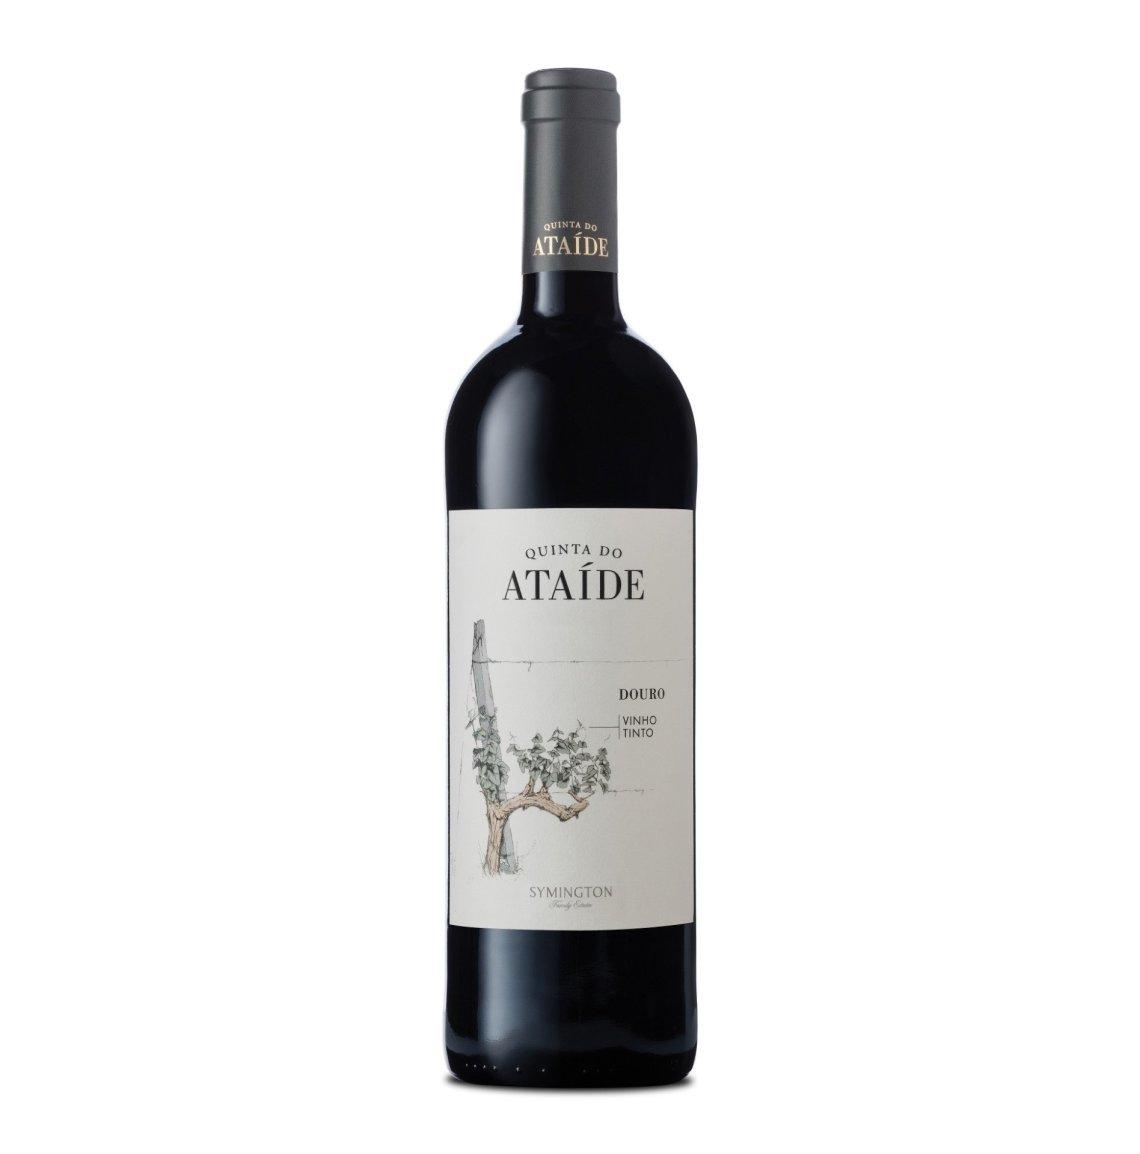 2015 Quinta do Ataide Douro Vinho Tinto DOC